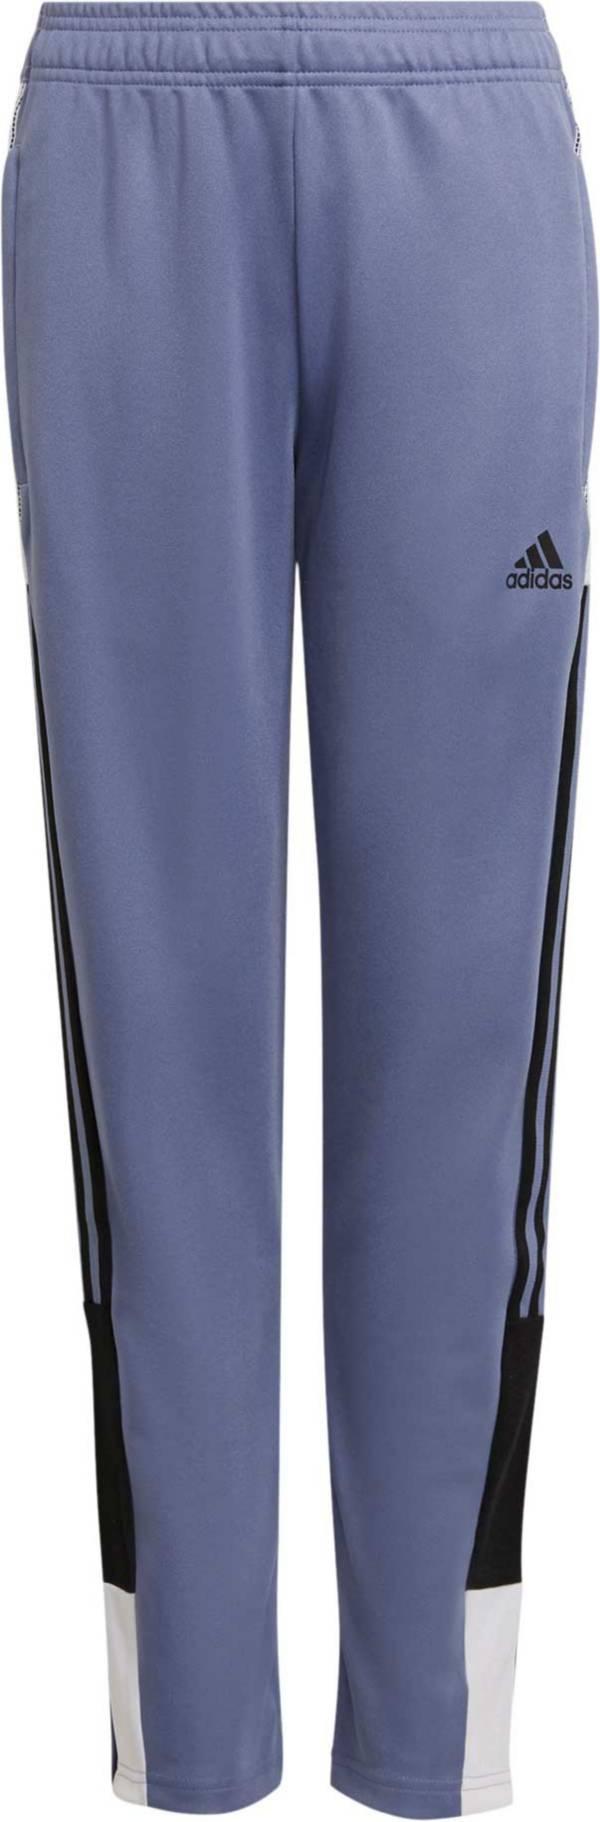 adidas Kids' Tiro Track Pants product image